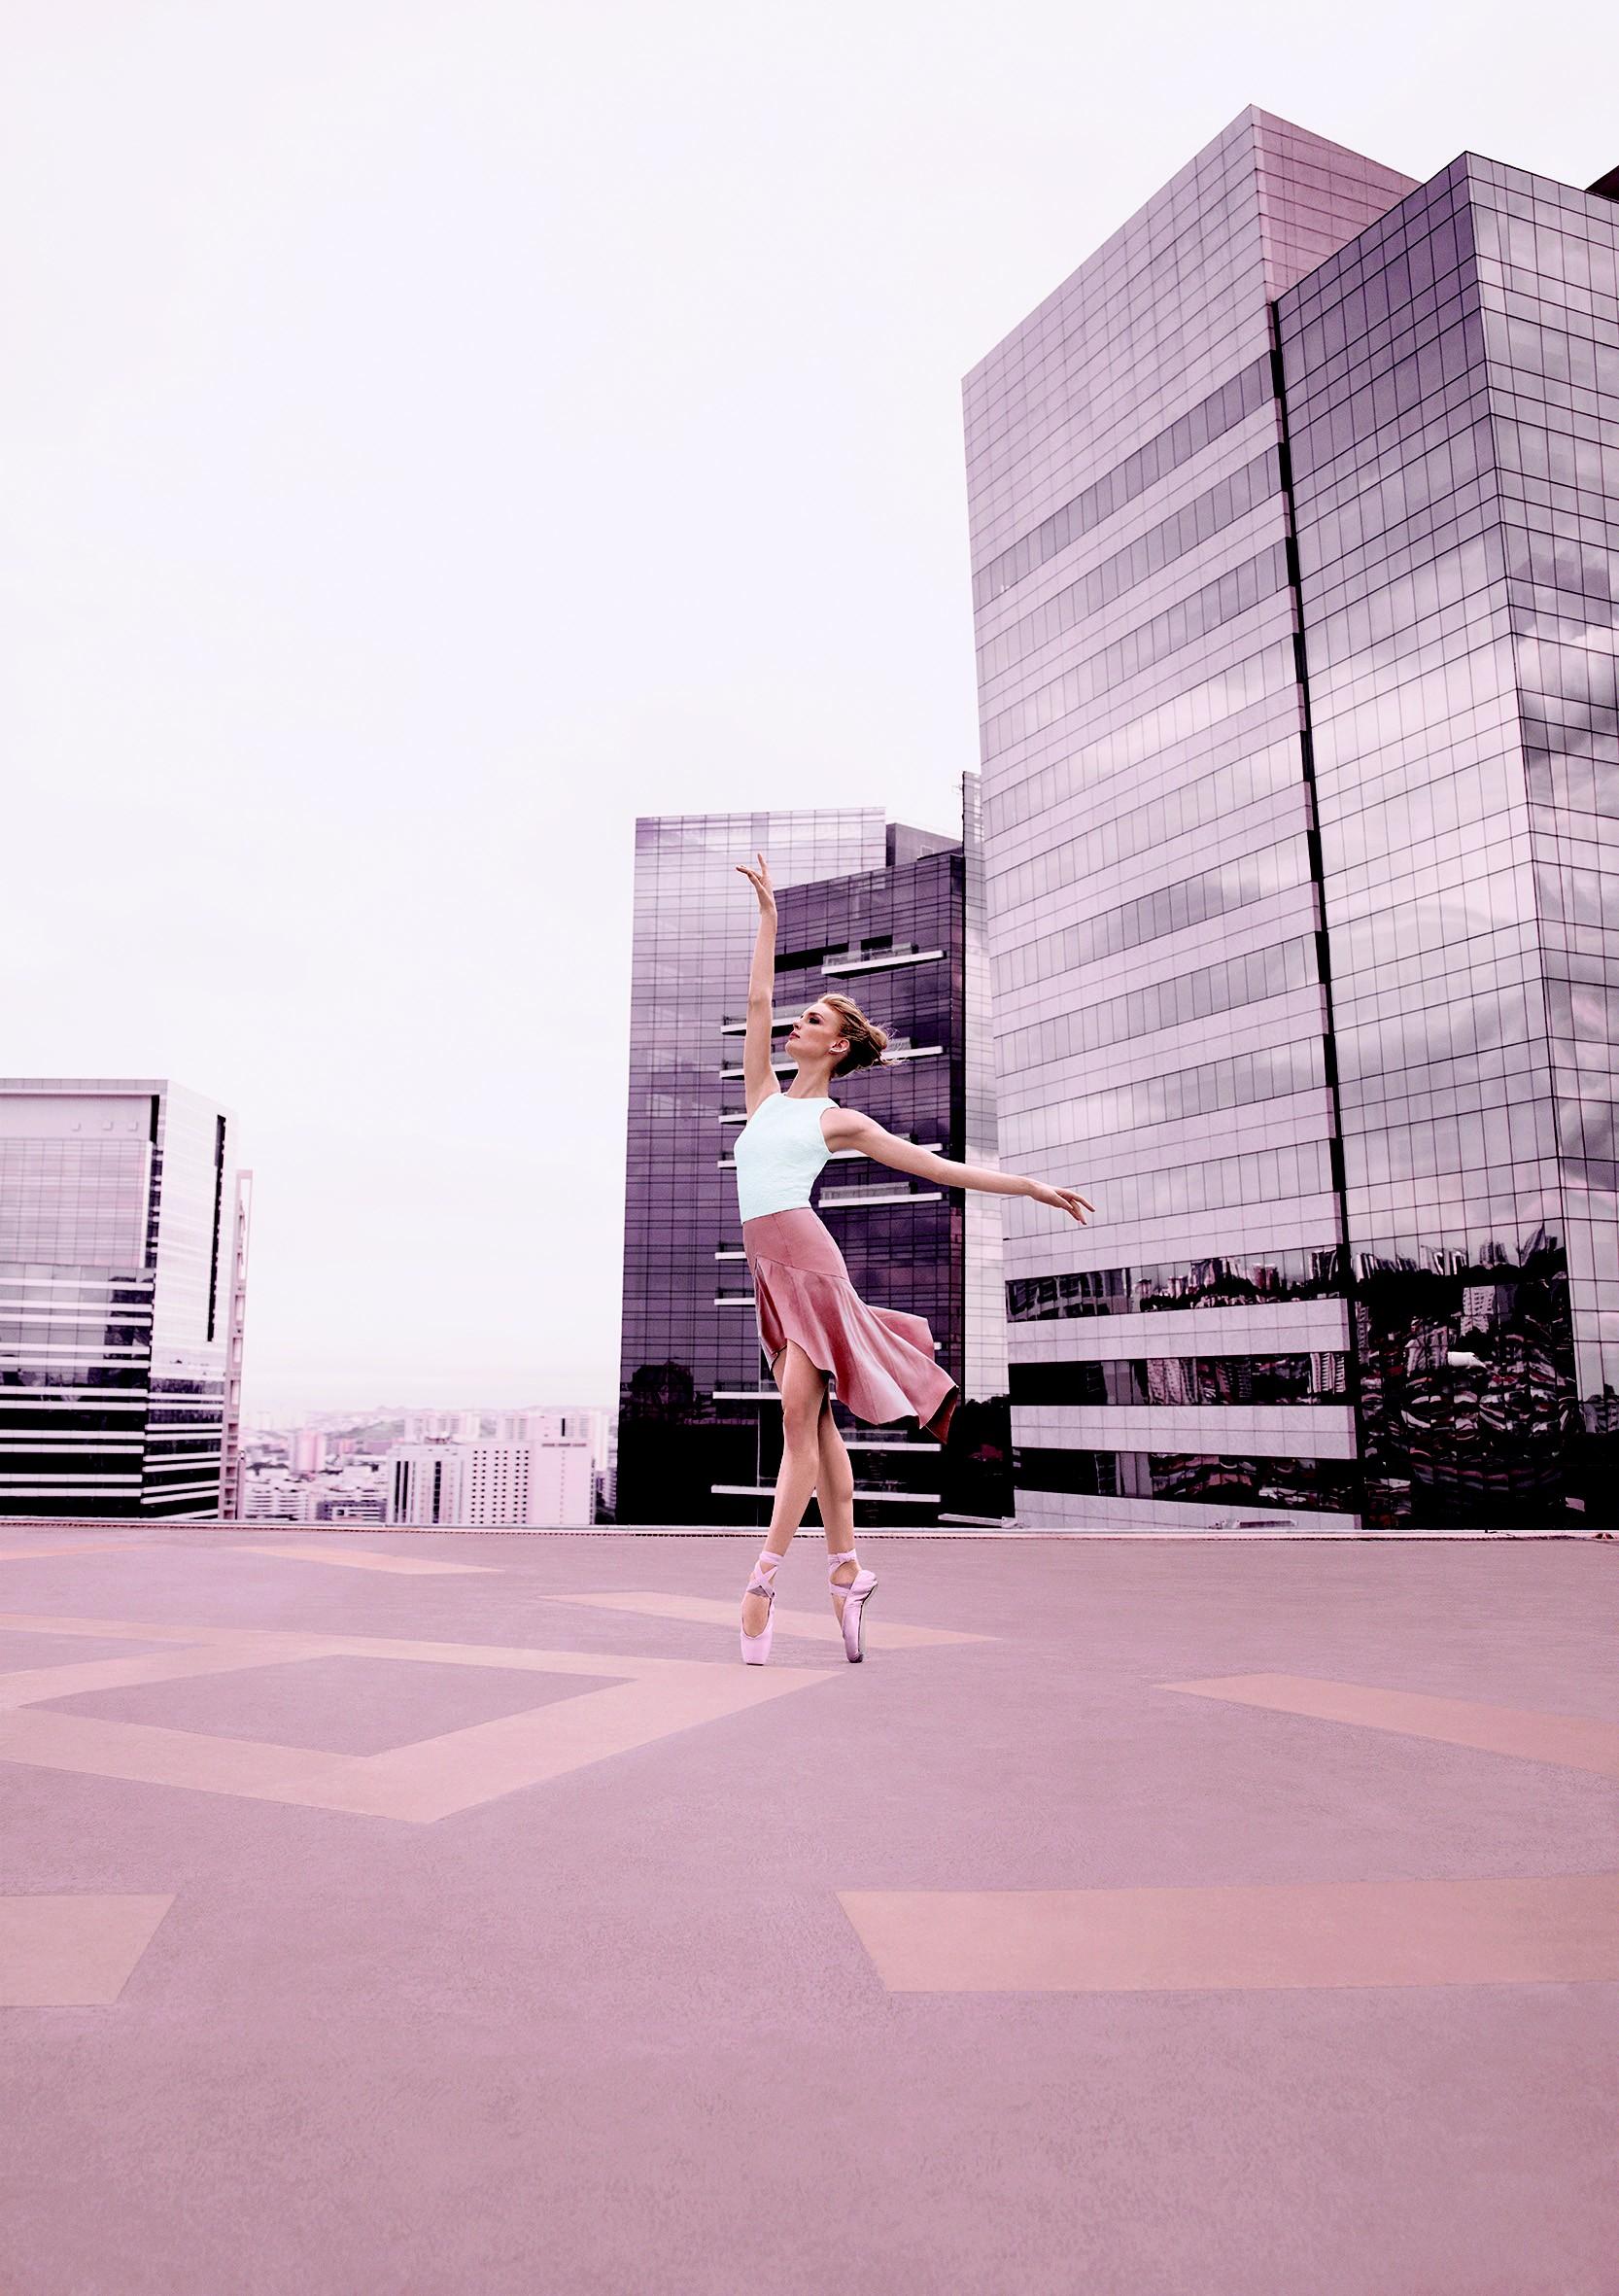 bt_16_04_modelo_clara_rooftop_ins